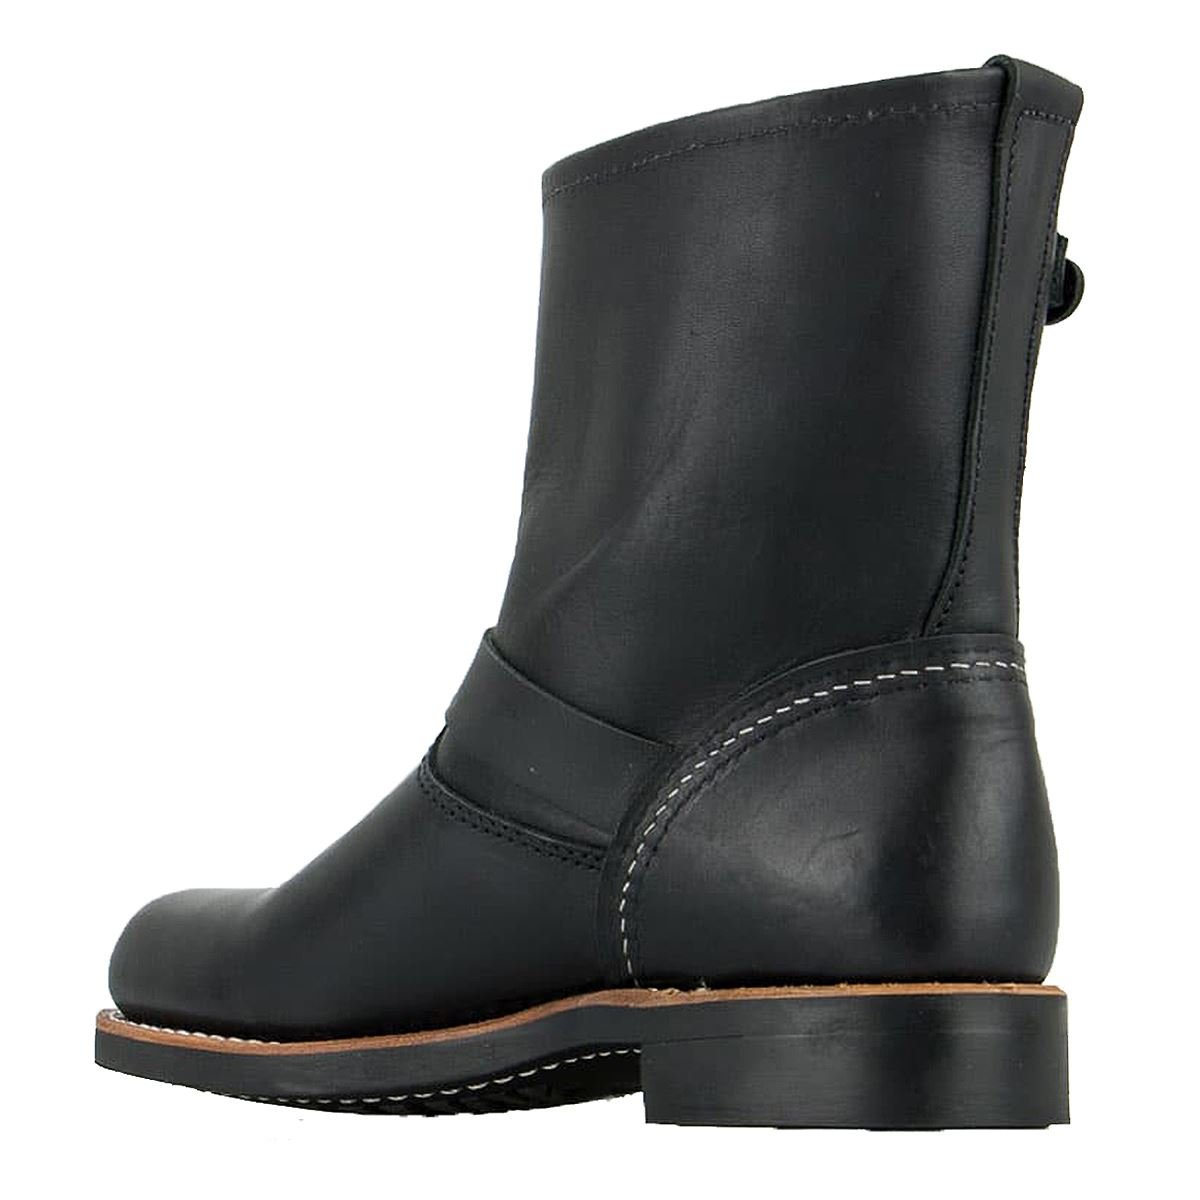 Rot damen Wing damen Rot Engineer 3354 schwarz Leather Stiefel 38 EU 9141ab